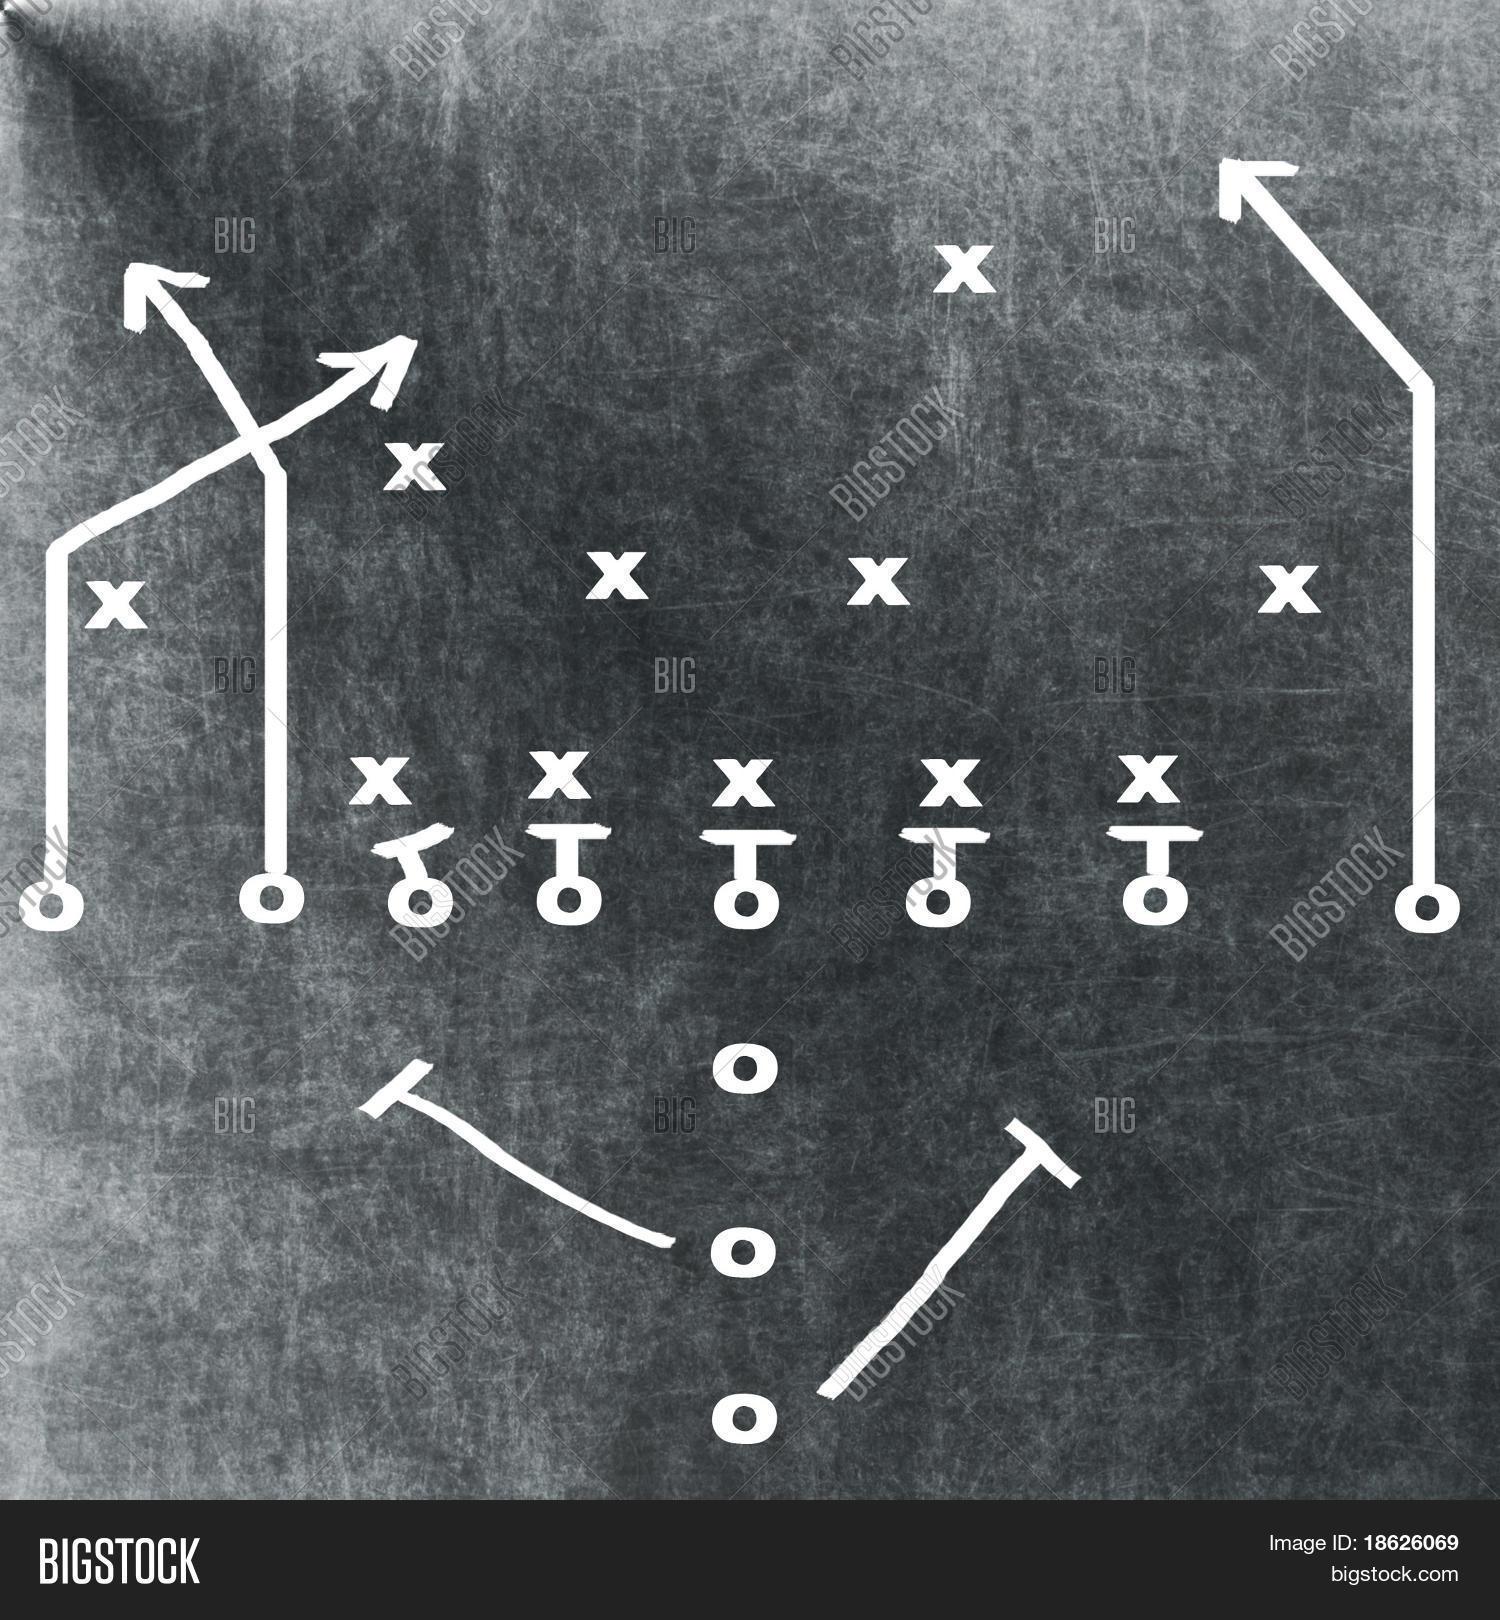 Football play on chalkboard image photo bigstock football play on a chalkboard pooptronica Images